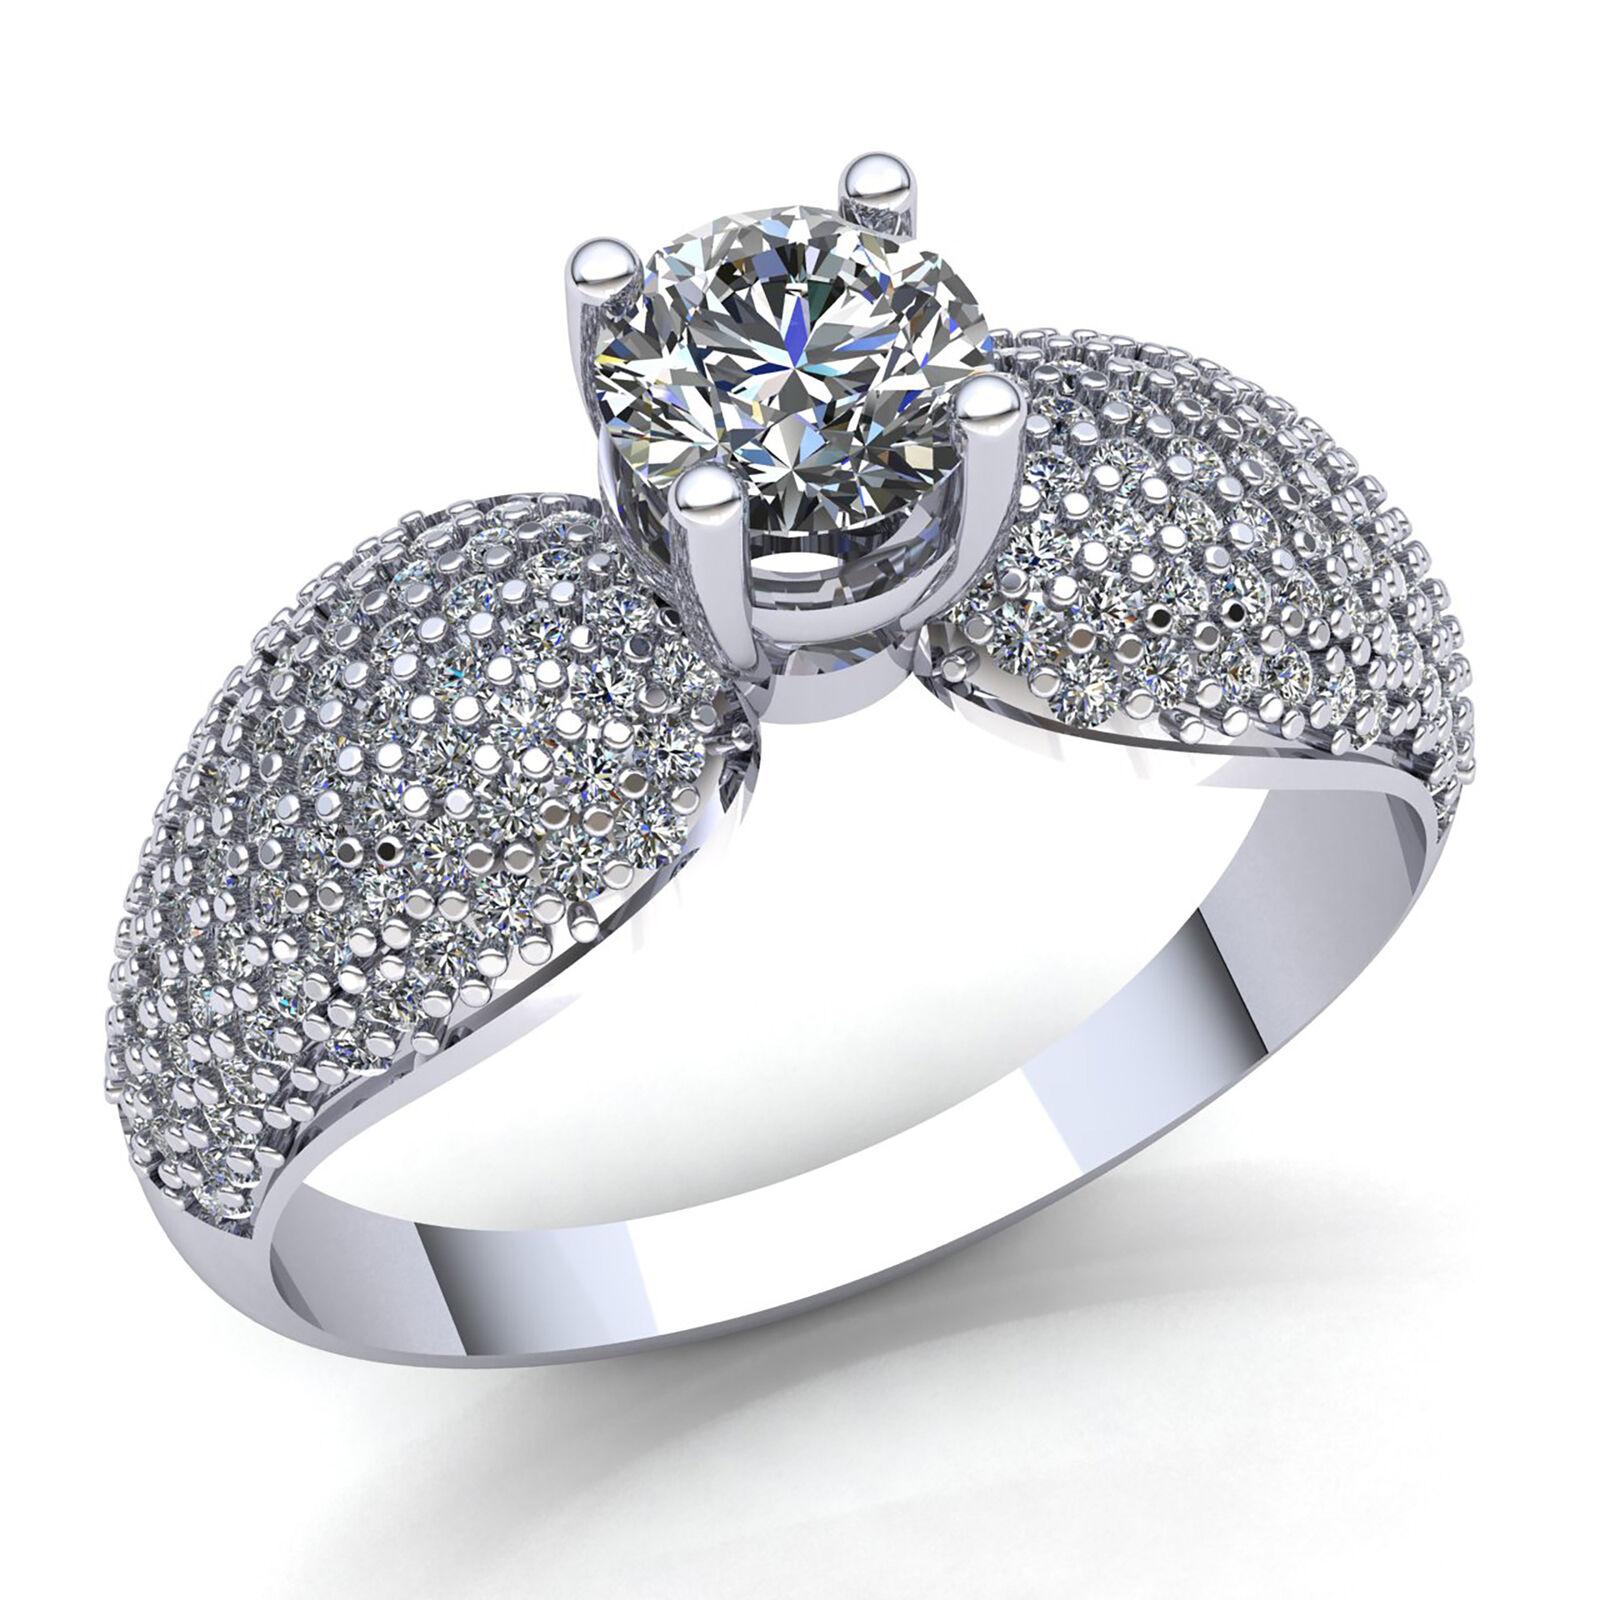 Genuine 1ct Round Cut Diamond Ladies Cluster Solitaire Engagement Ring 10K gold